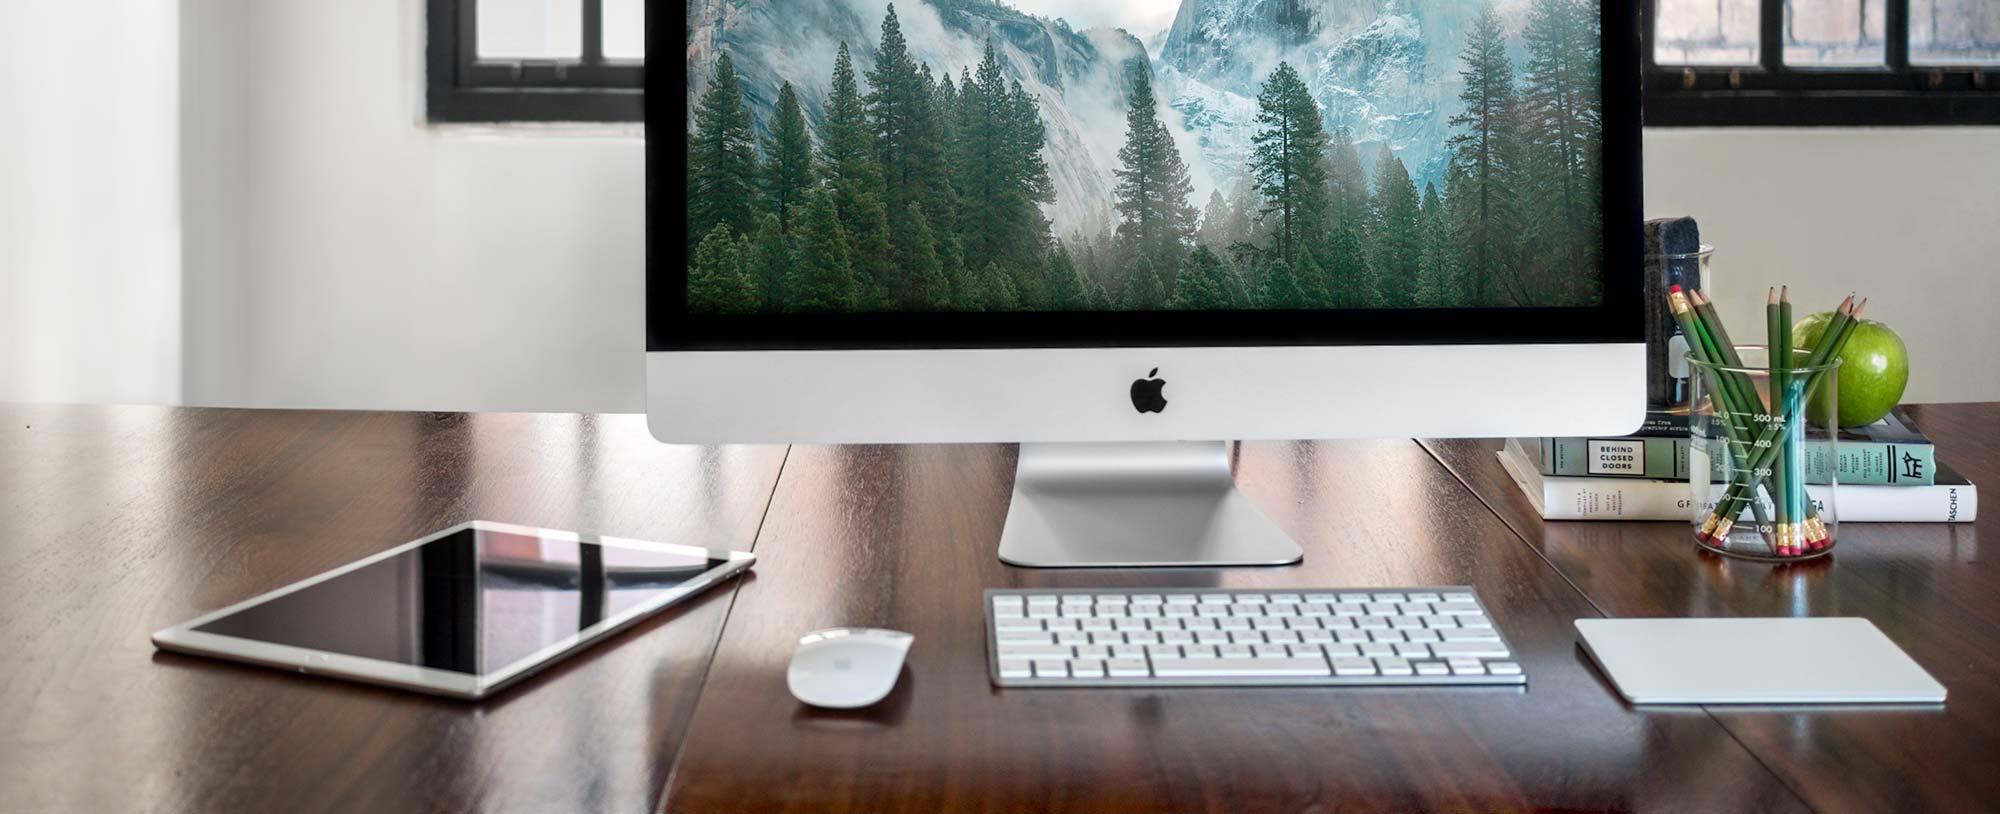 Apple Mac Desktop | B&H Photo Video